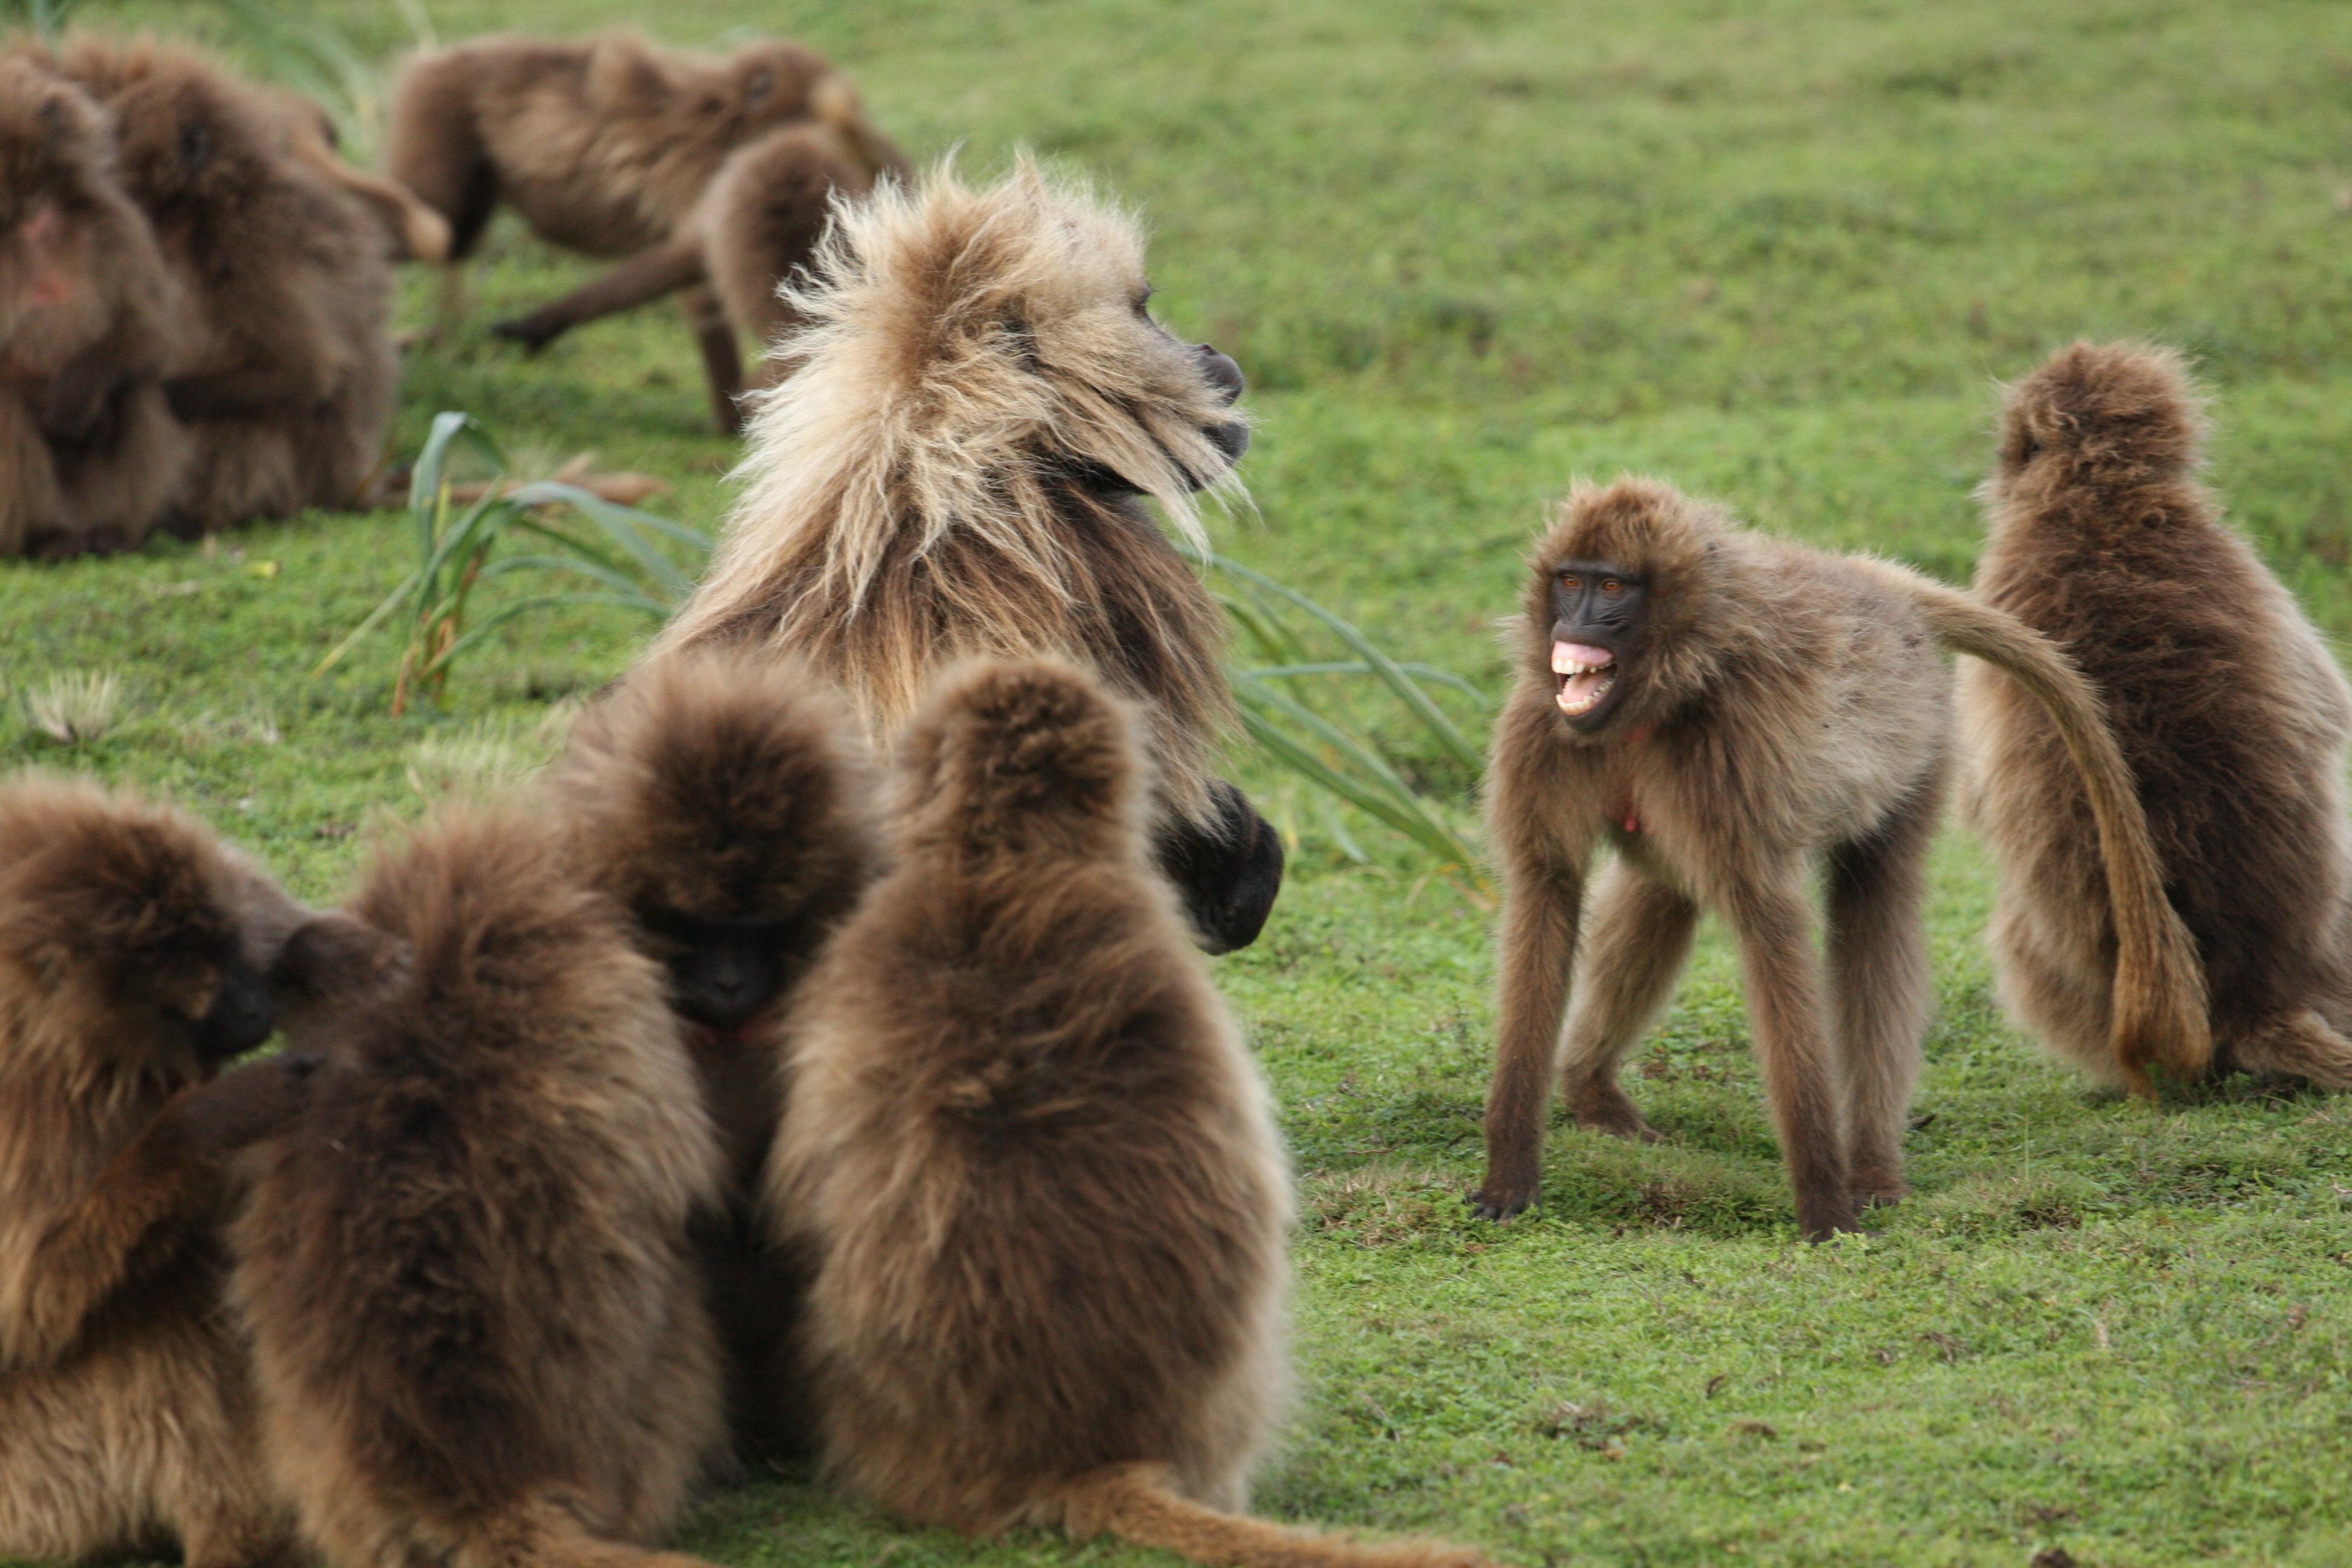 Gelada monkeys in conversation. Image courtesy: Clay Wilton